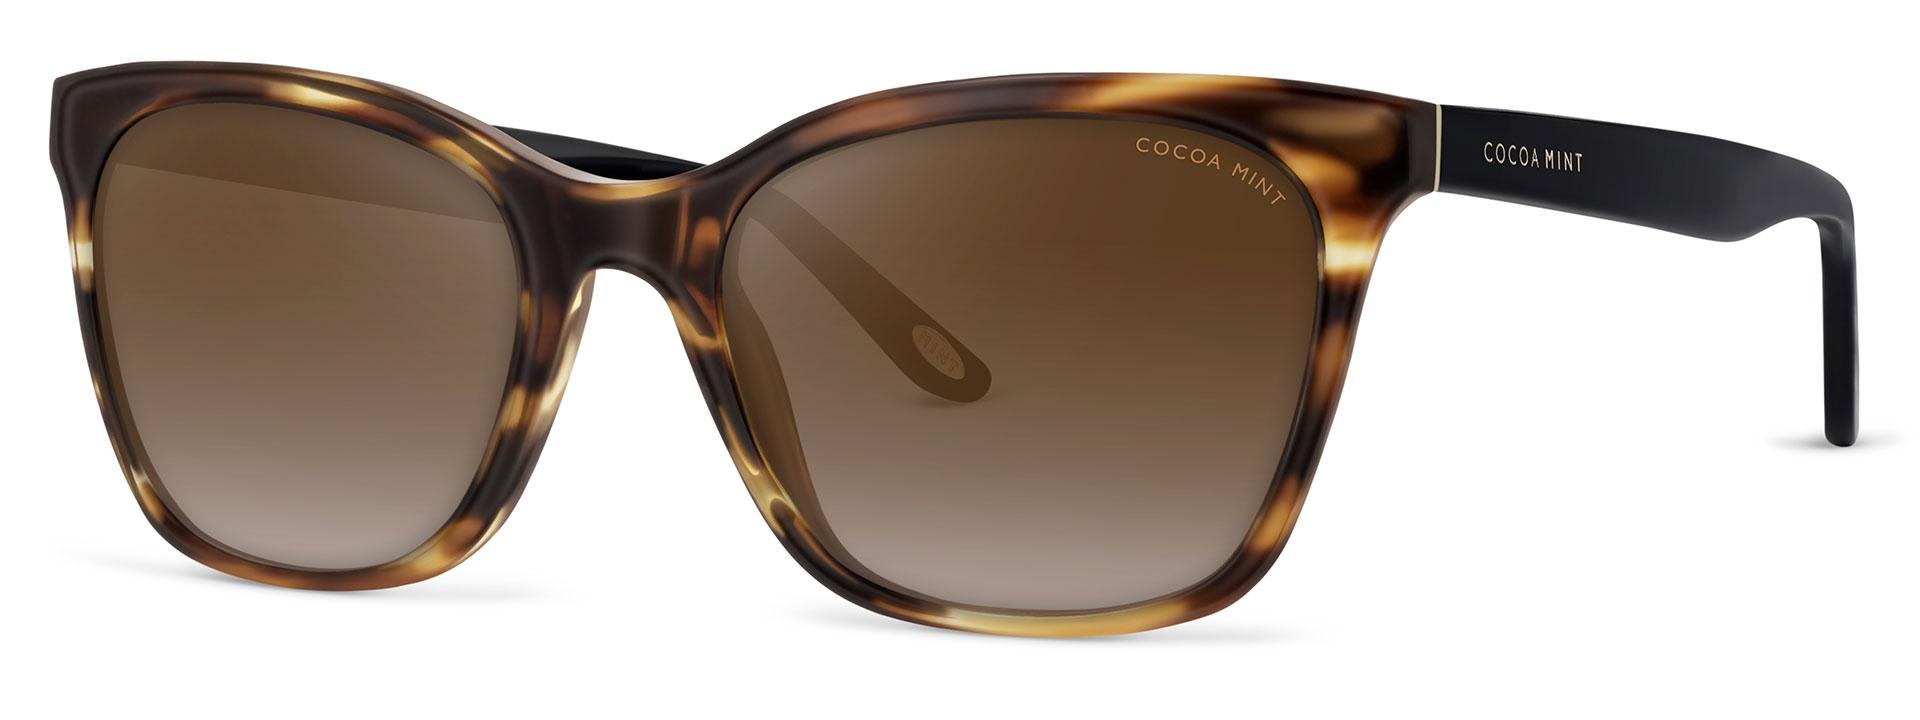 Cocoa Mint Sun Glasses - Havana-Black - CMS2061-C1